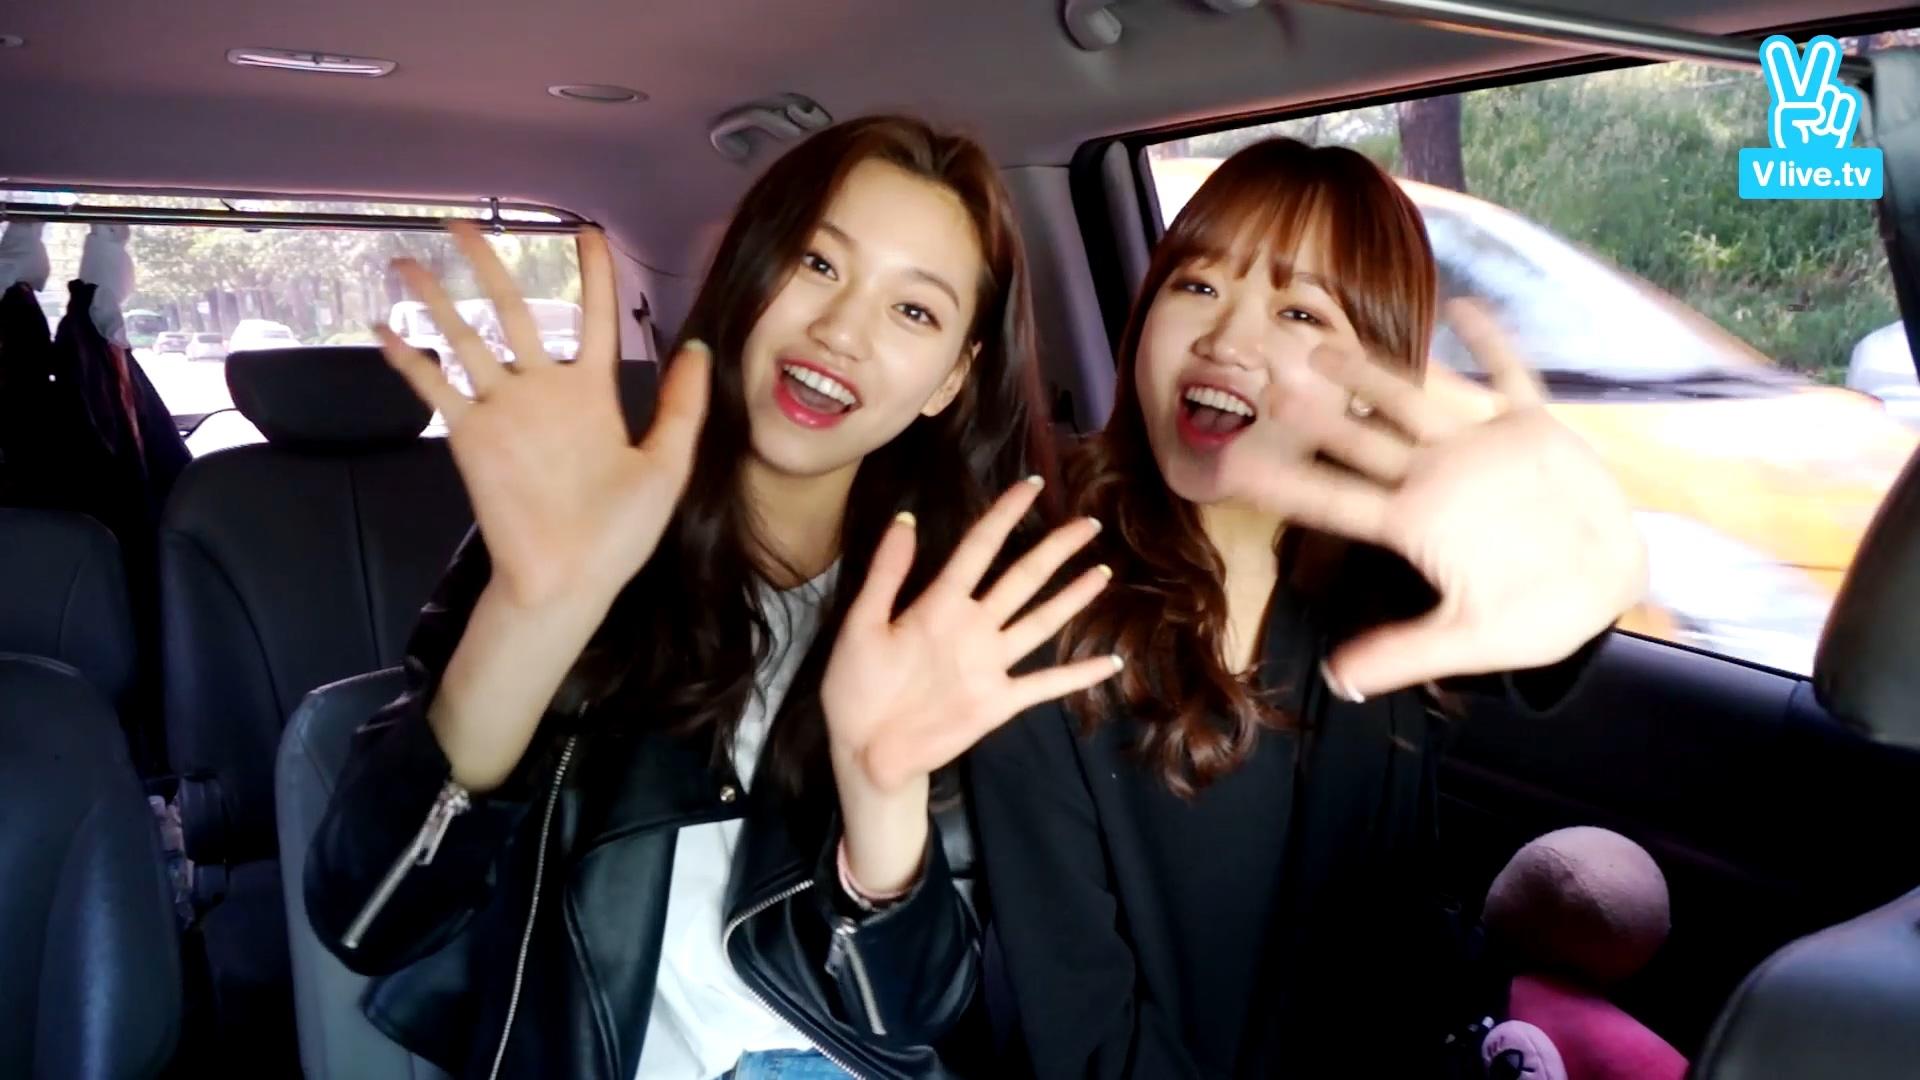 V LIVE - 김도연&최유정 - 판타지오뮤직 V 채널 오픈! Fantagio Music V OPEN!